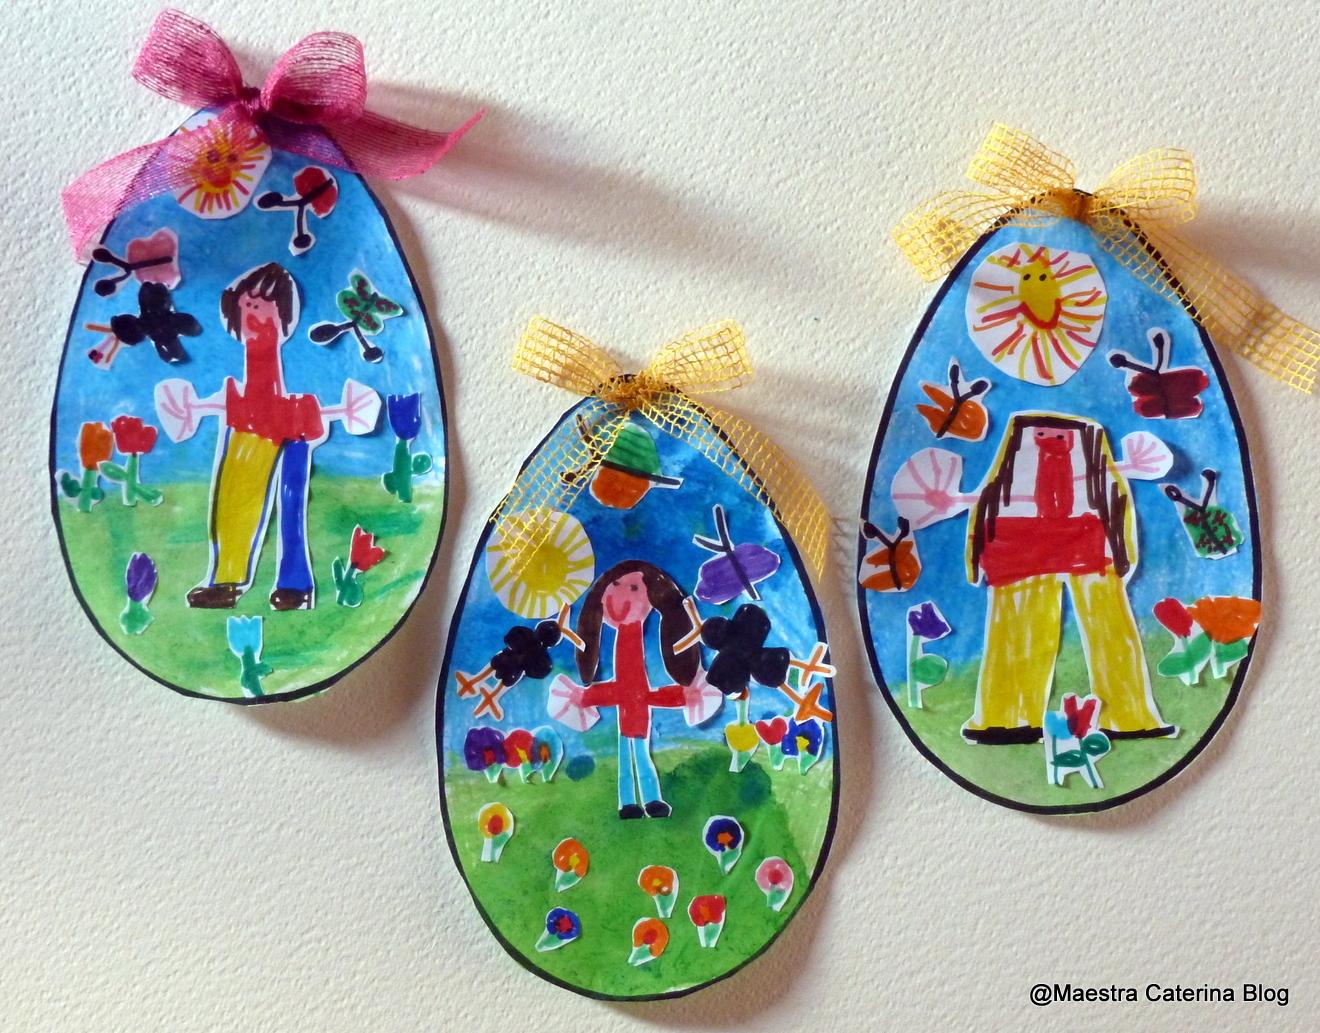 Maestra Caterina Uova Di Pasqua